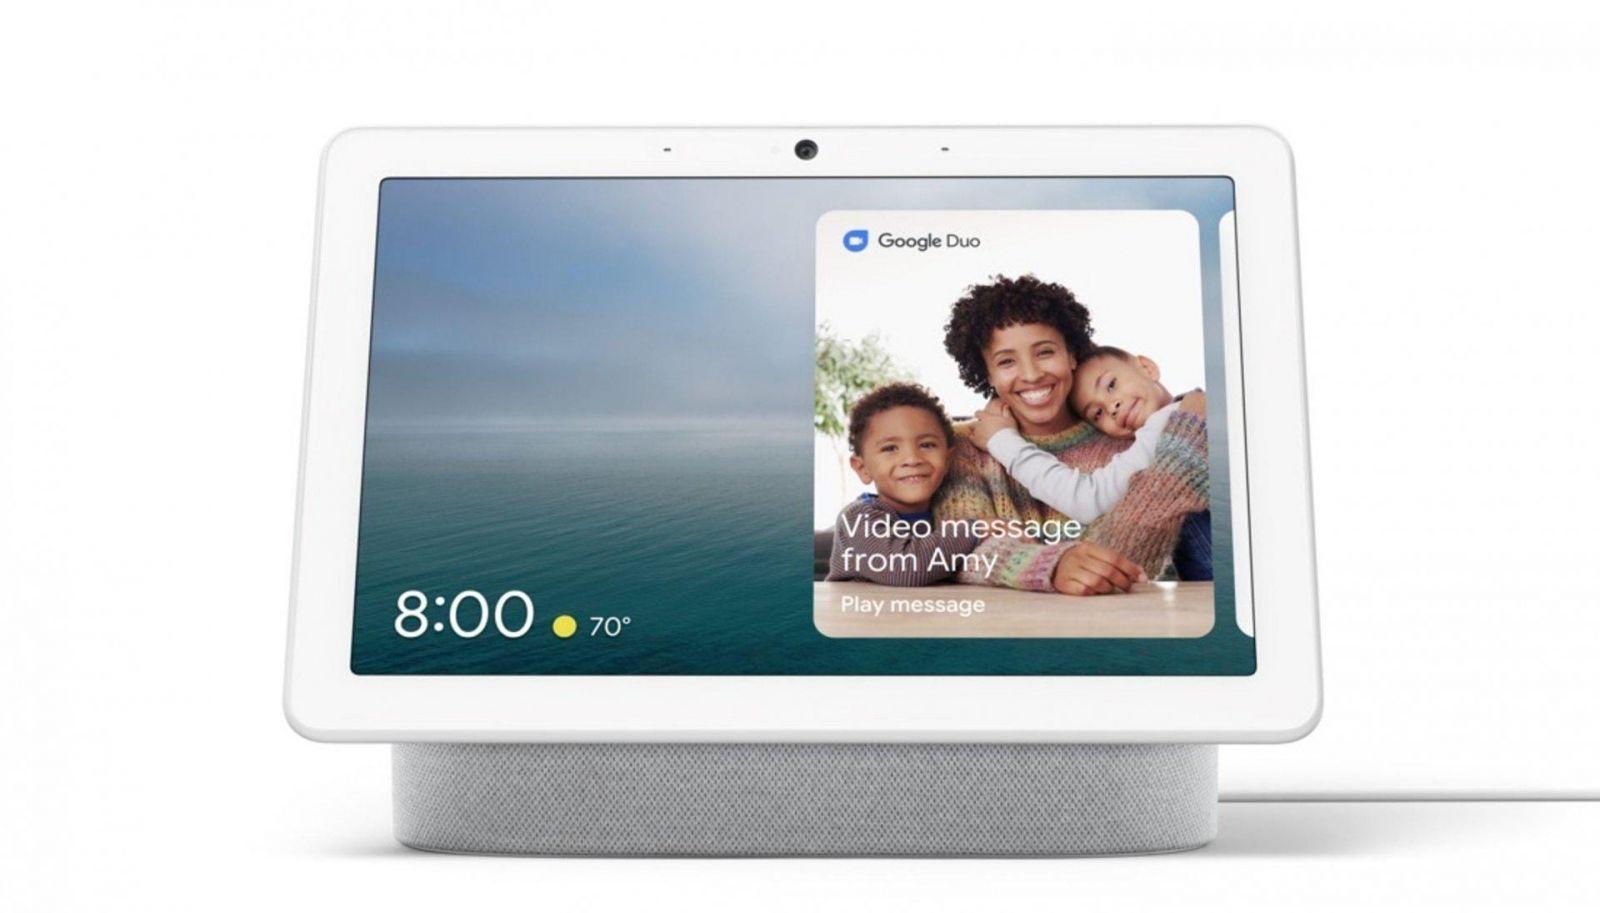 Google I/O 2019: Google представила умный дисплей Nest Hub Max (0cce2b47 e4ed 44fa 8be3 1bbb9e7c2583)